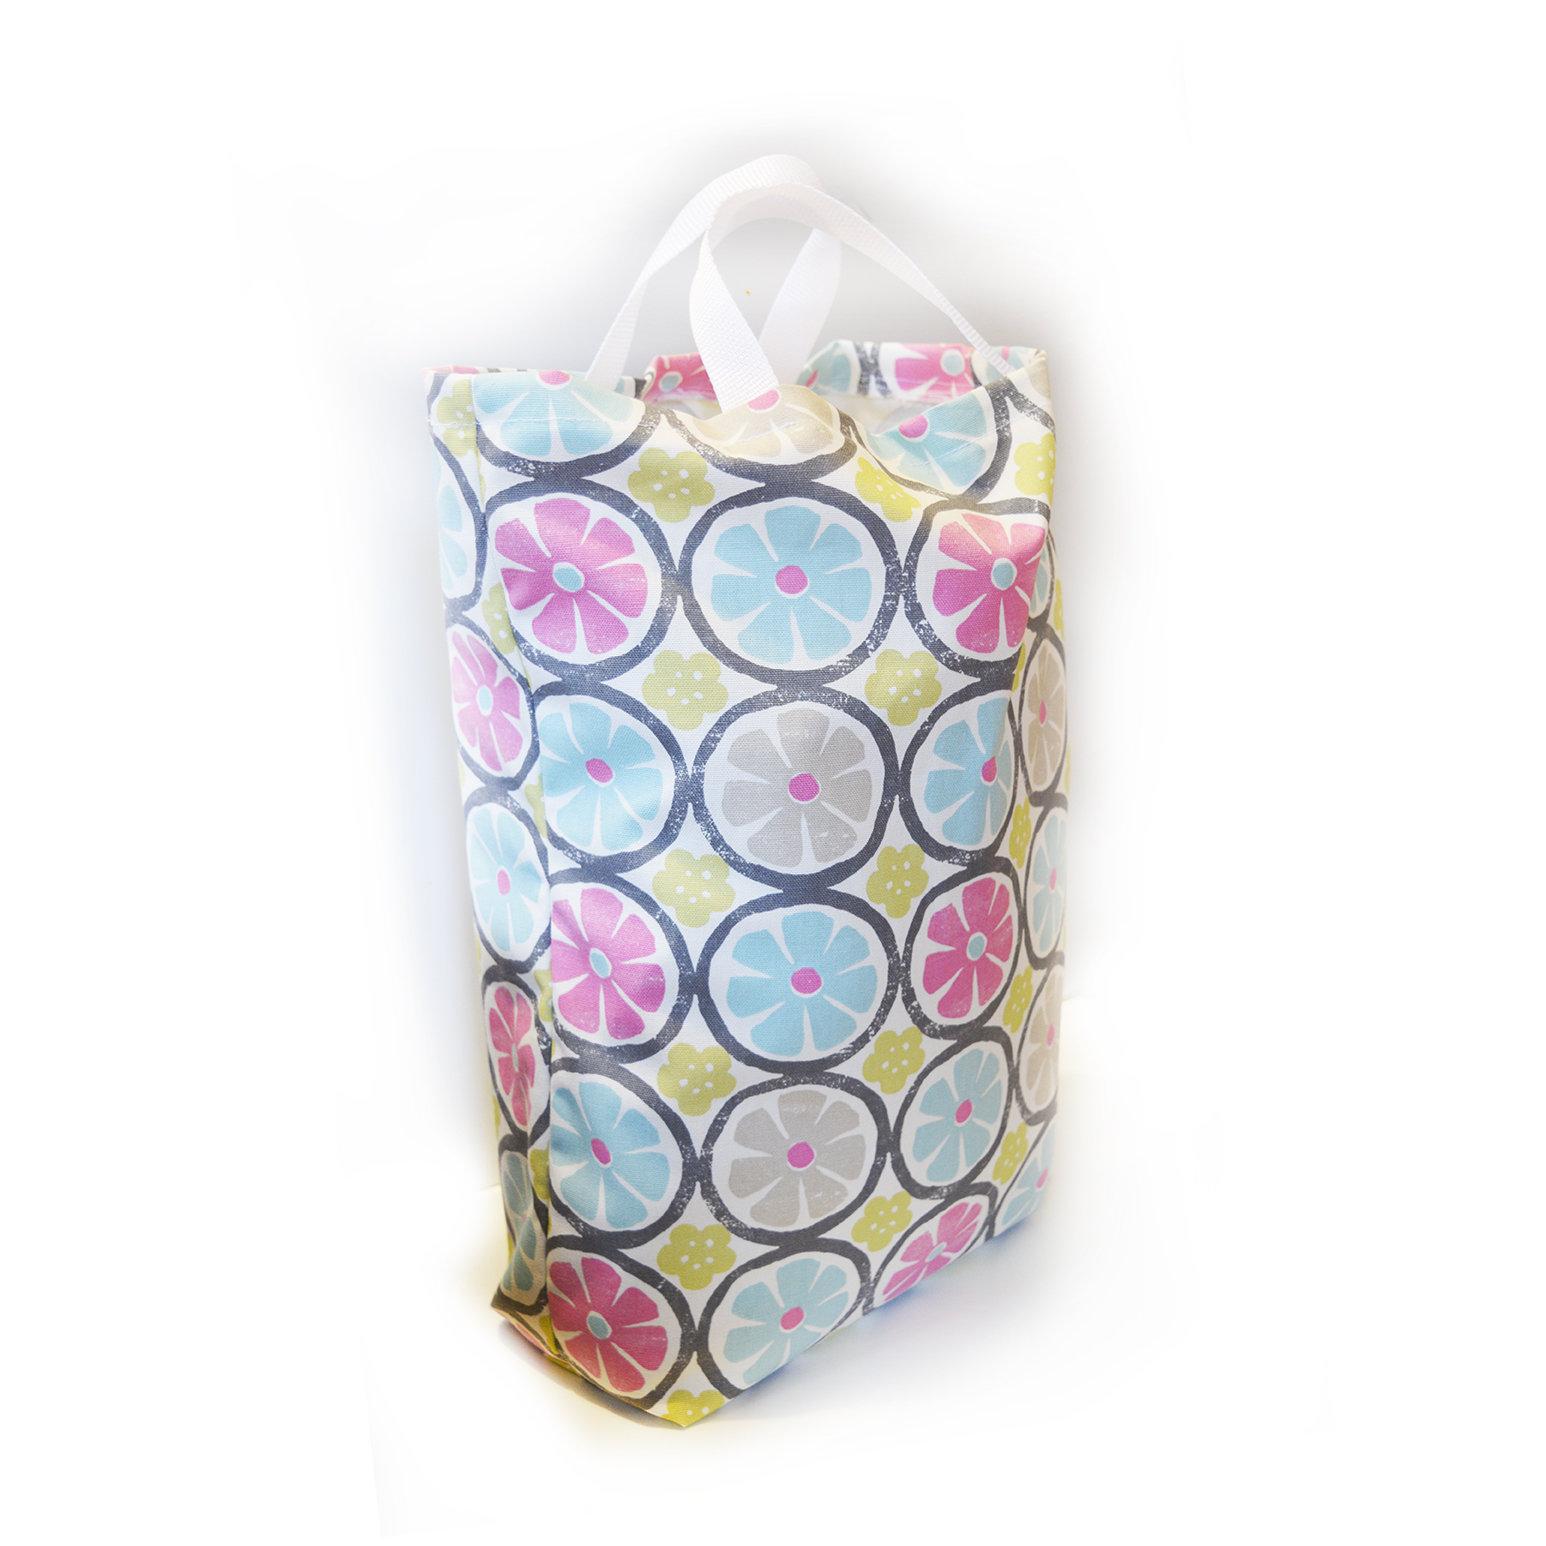 Simply Good™ Reusable Grocery Tote Bag 00406